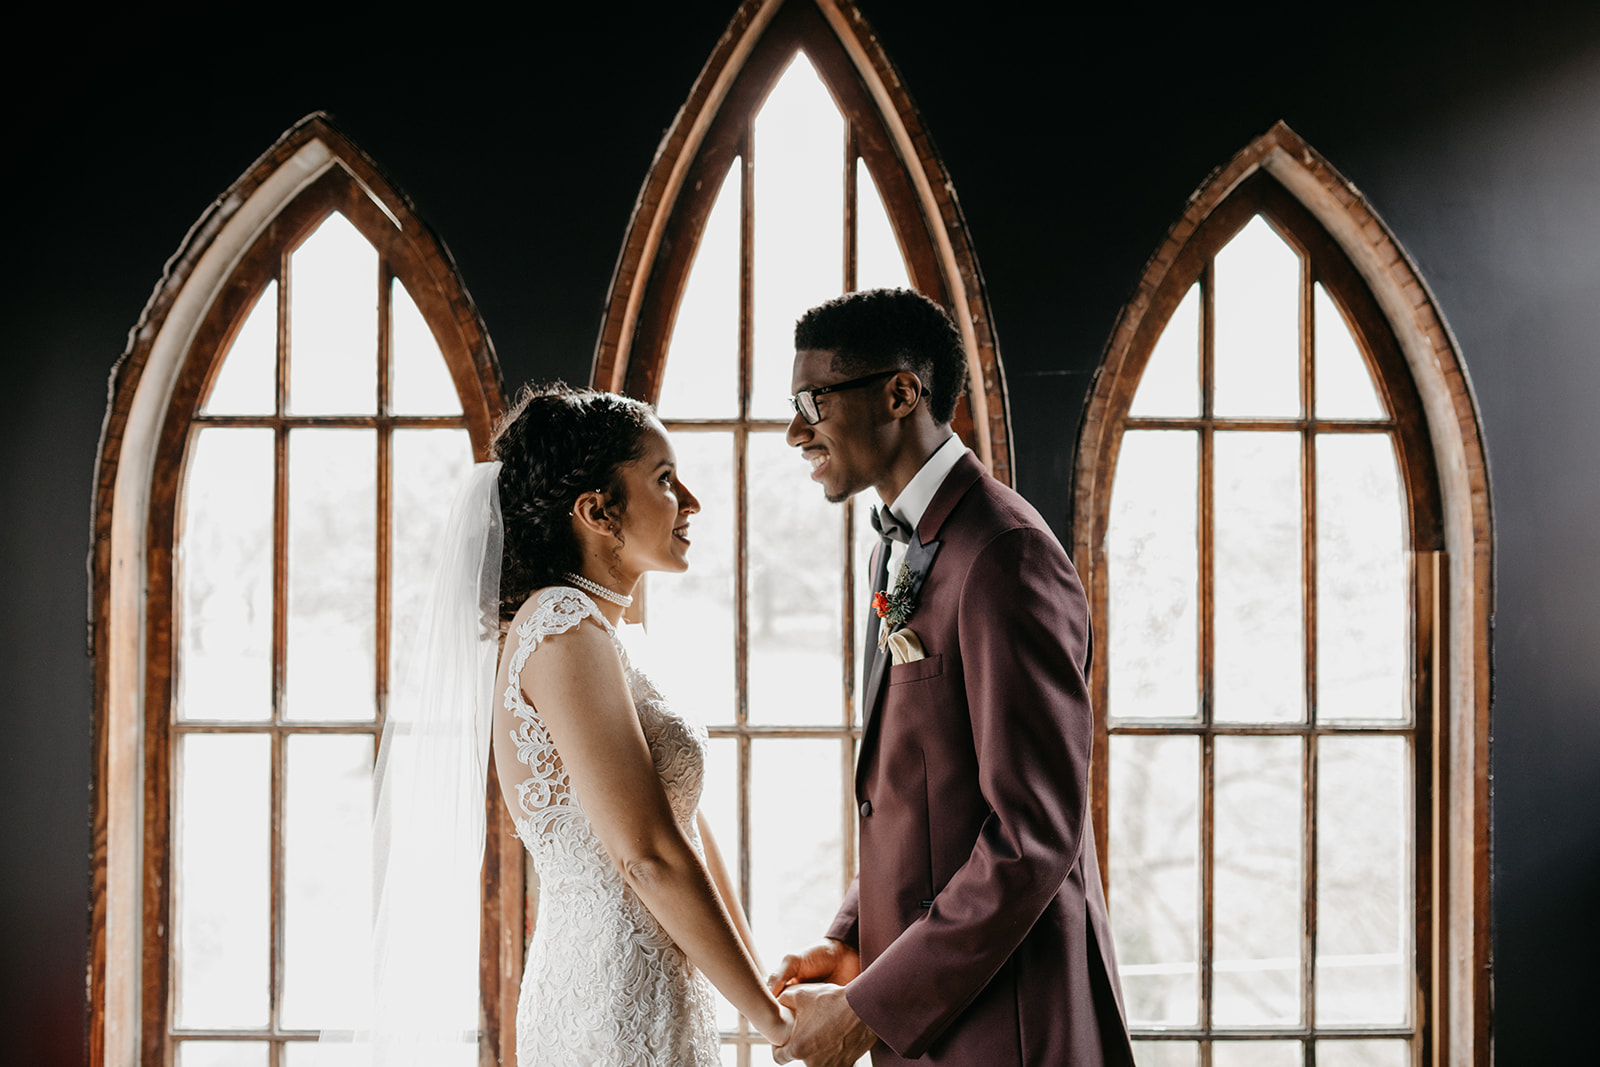 portland - wedding - photographer - doorofhopechurch212.jpg